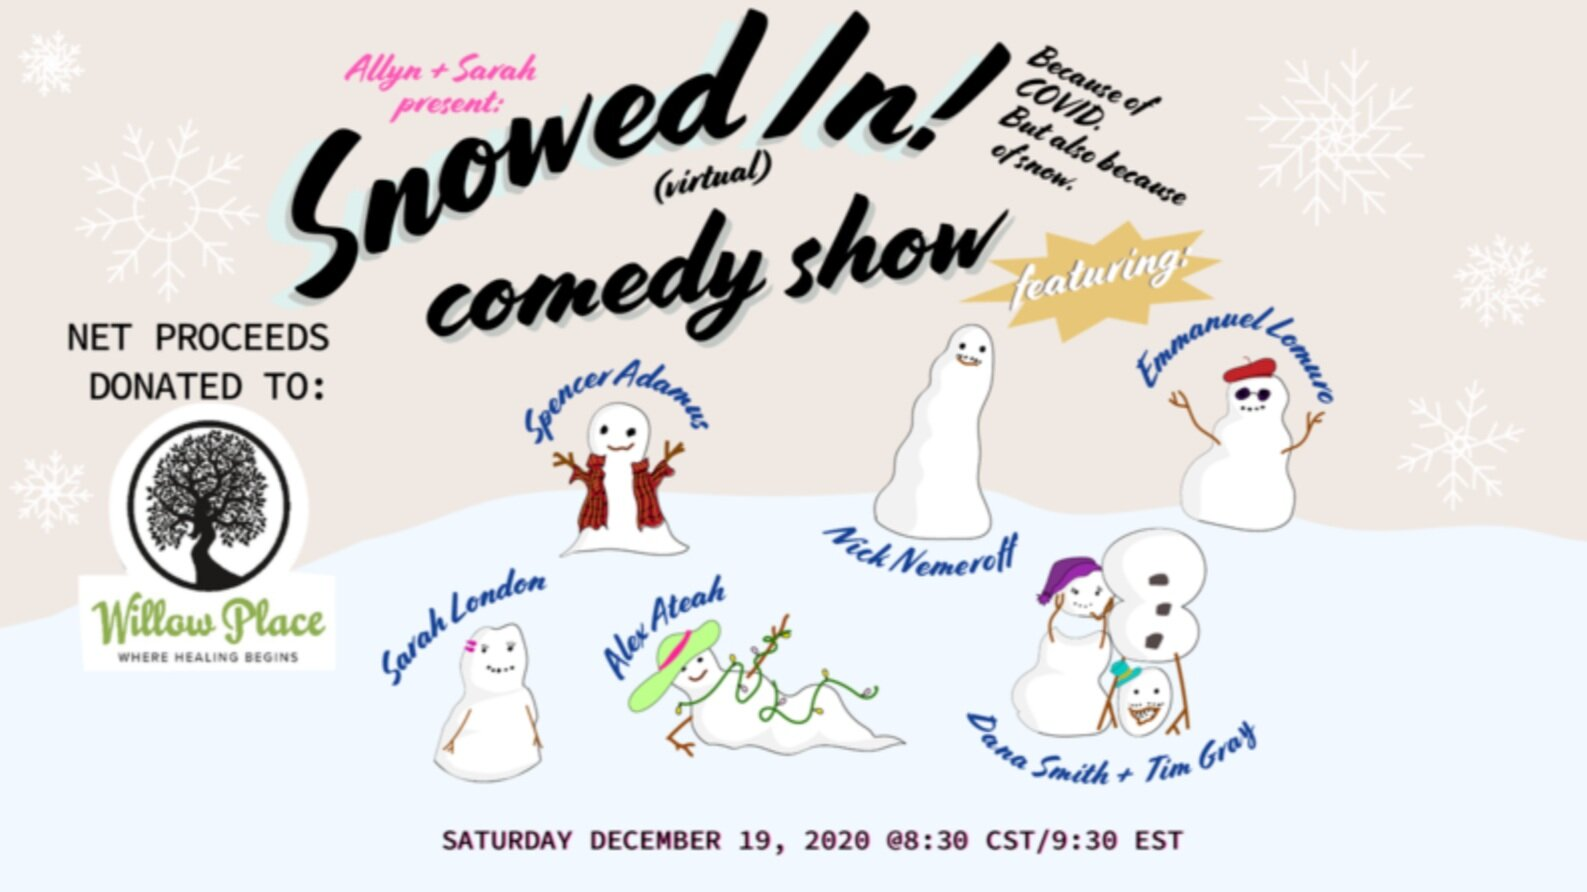 Snowed+In%21+Comedy+Show.jpg